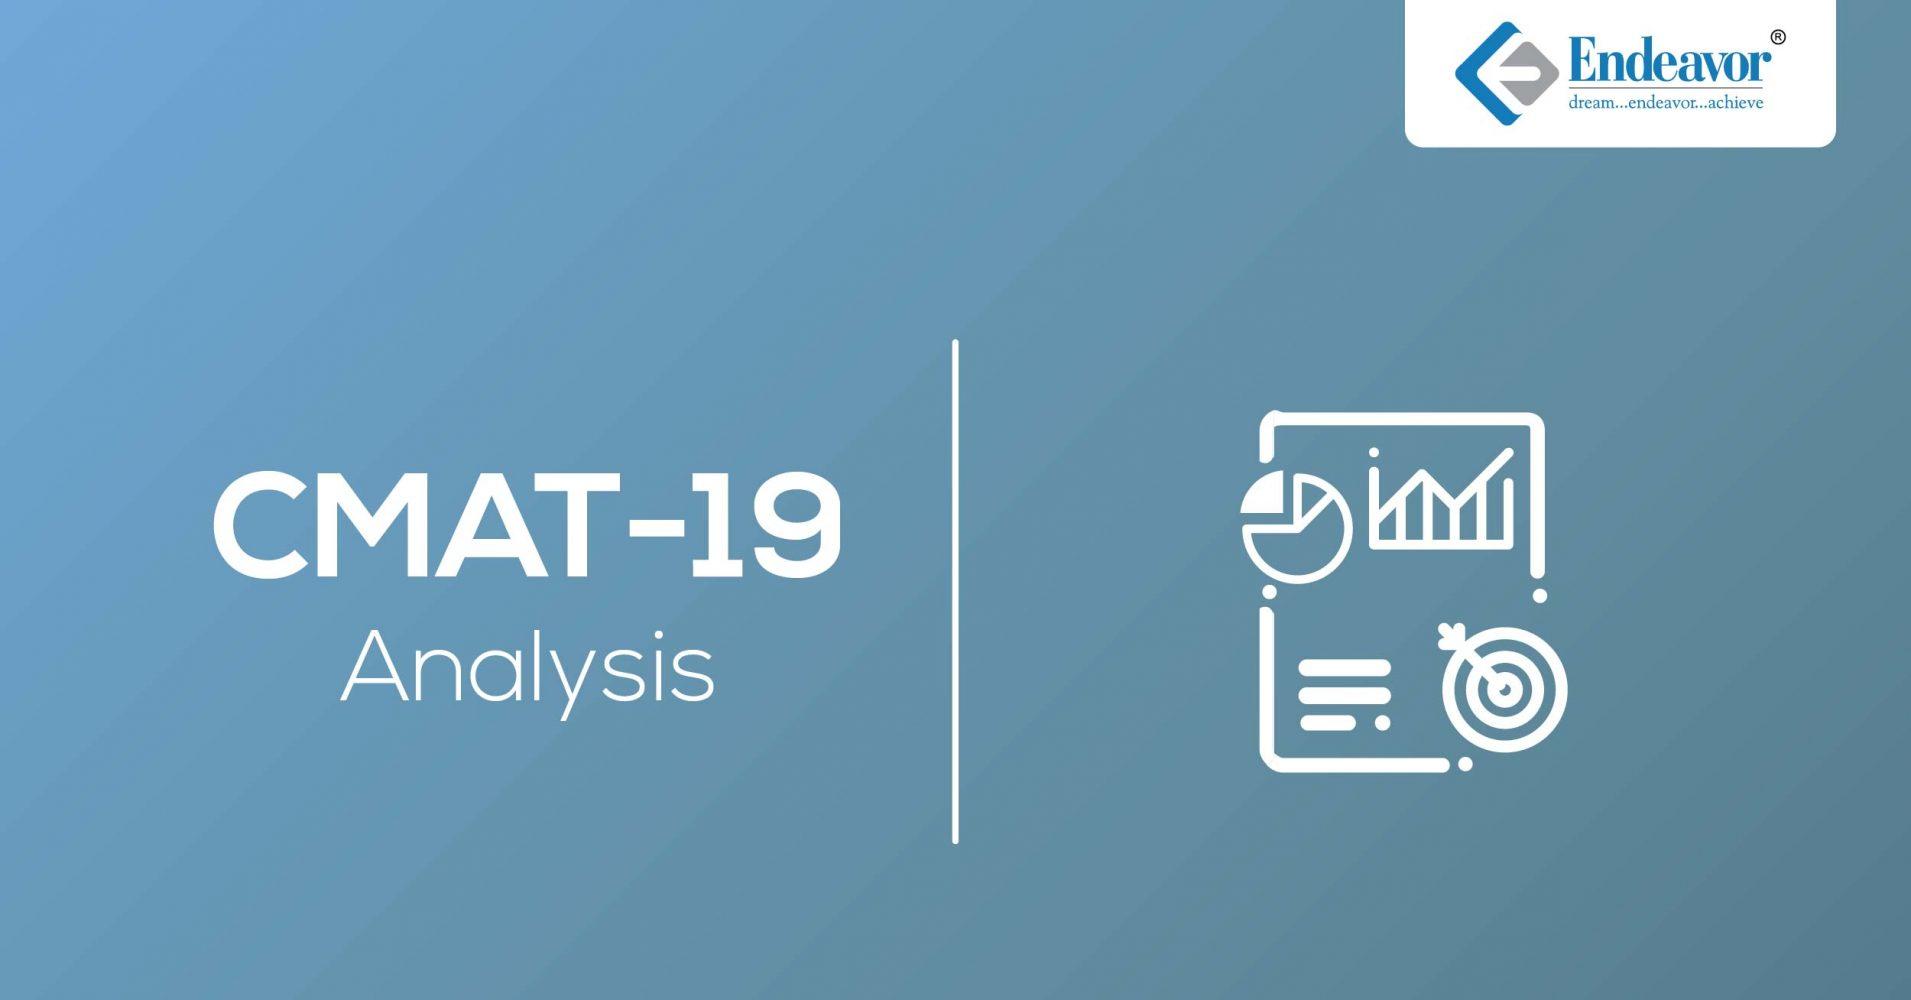 CMAT 2019 Analysis